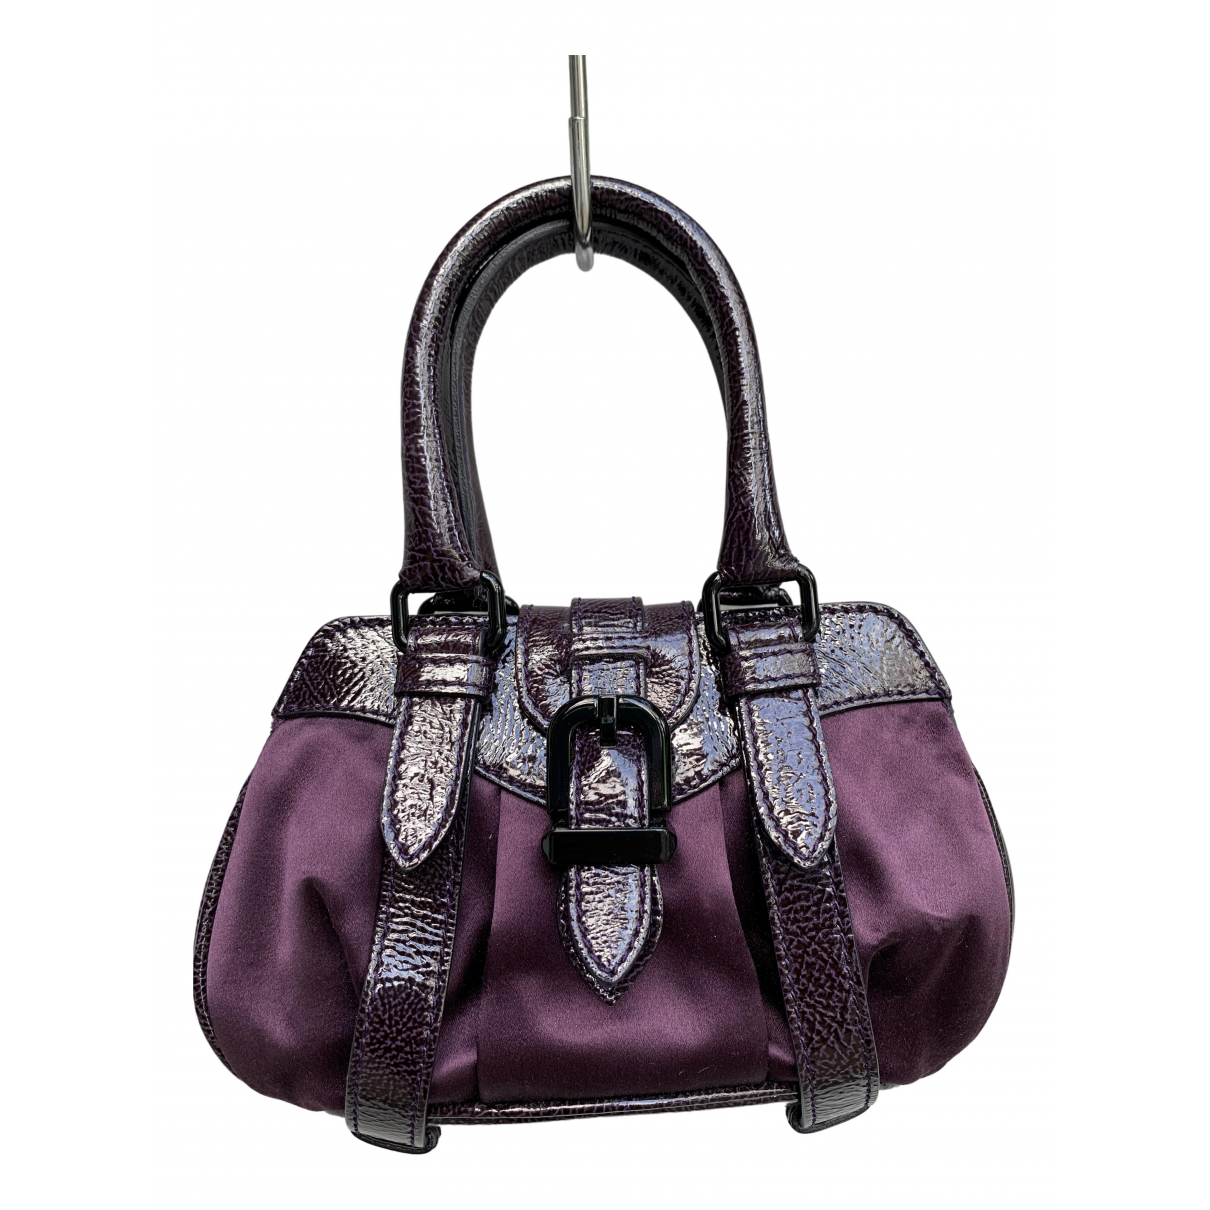 Alberta Ferretti \N Handtasche in  Lila Leinen